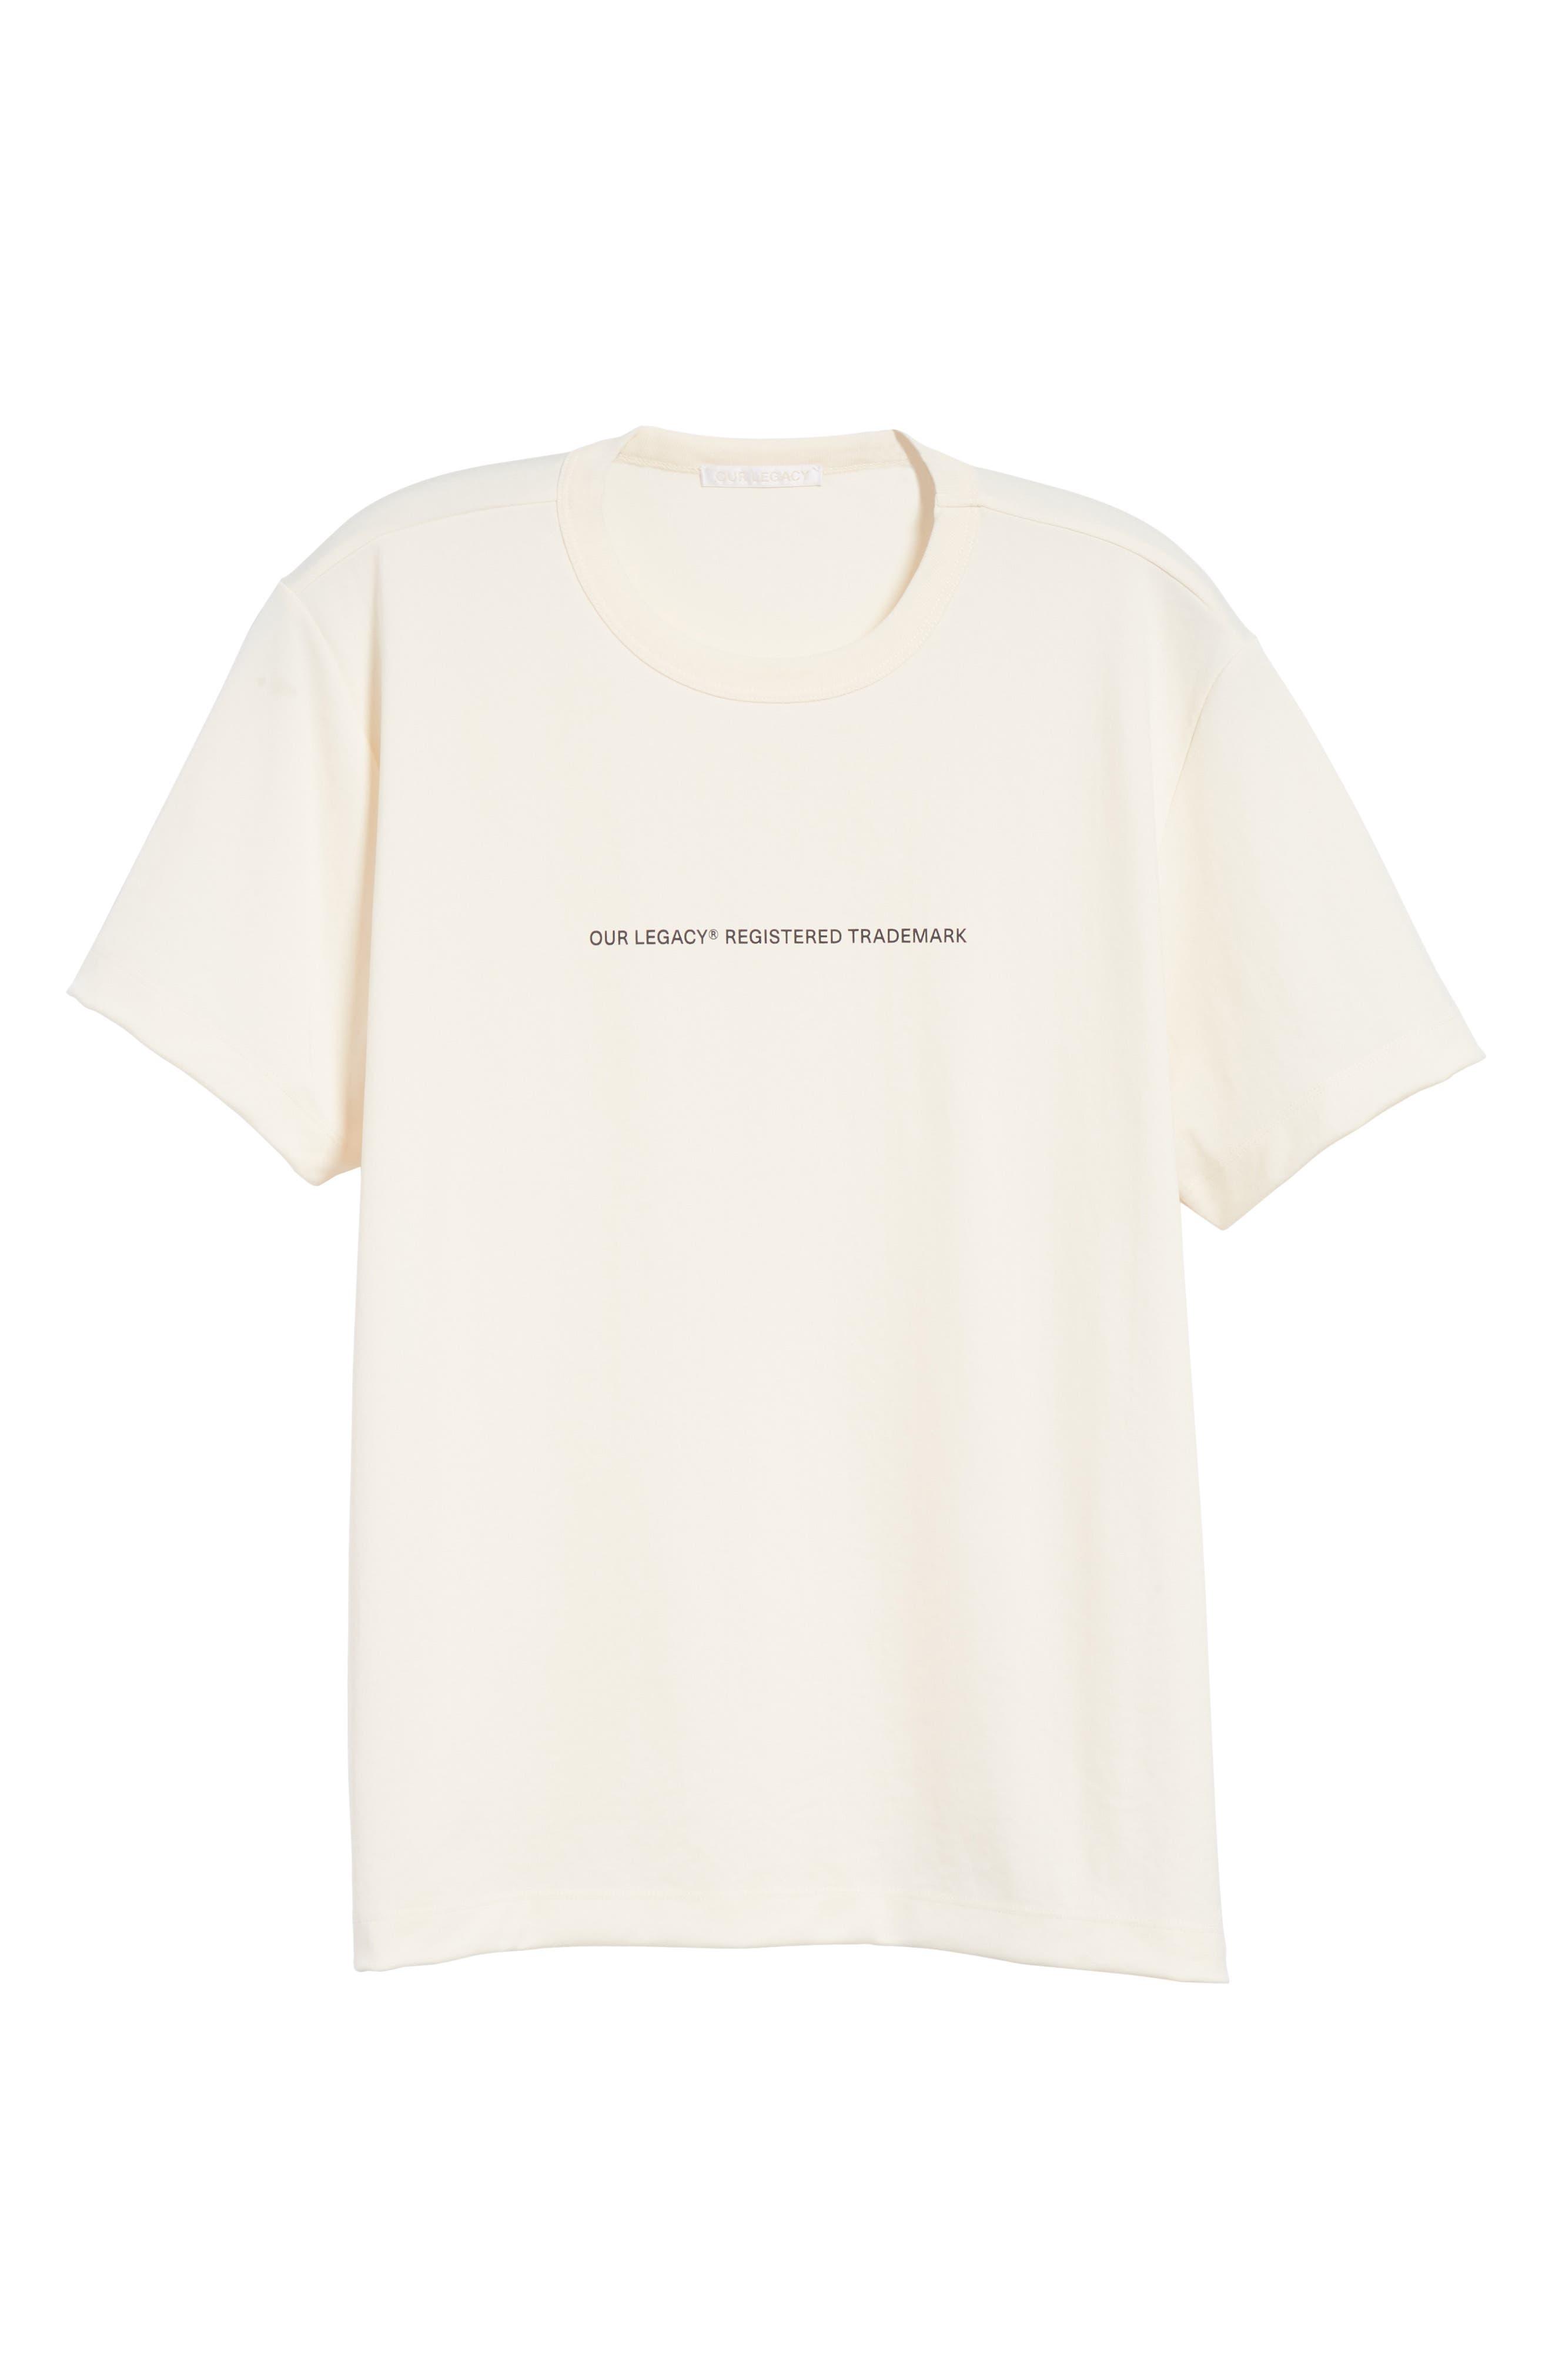 Trademark Graphic T-Shirt,                             Alternate thumbnail 6, color,                             100